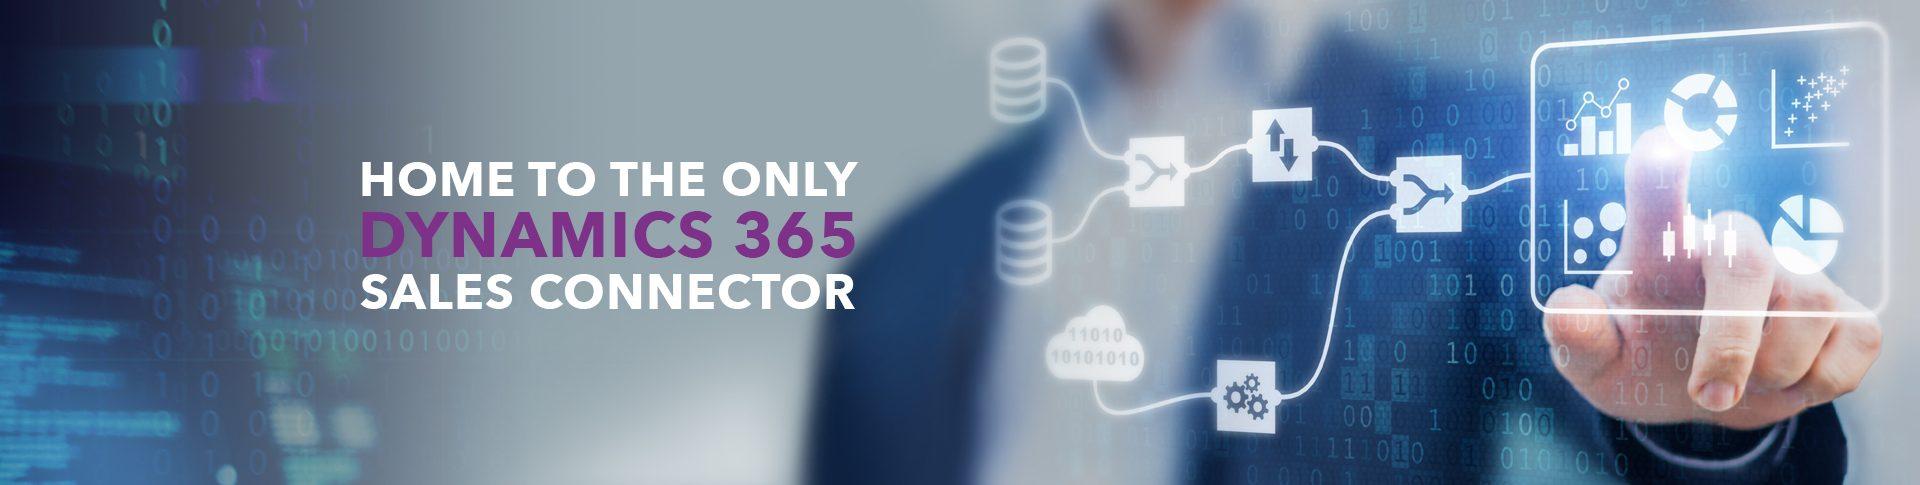 Sales-Connector-Web-Banner-0x0